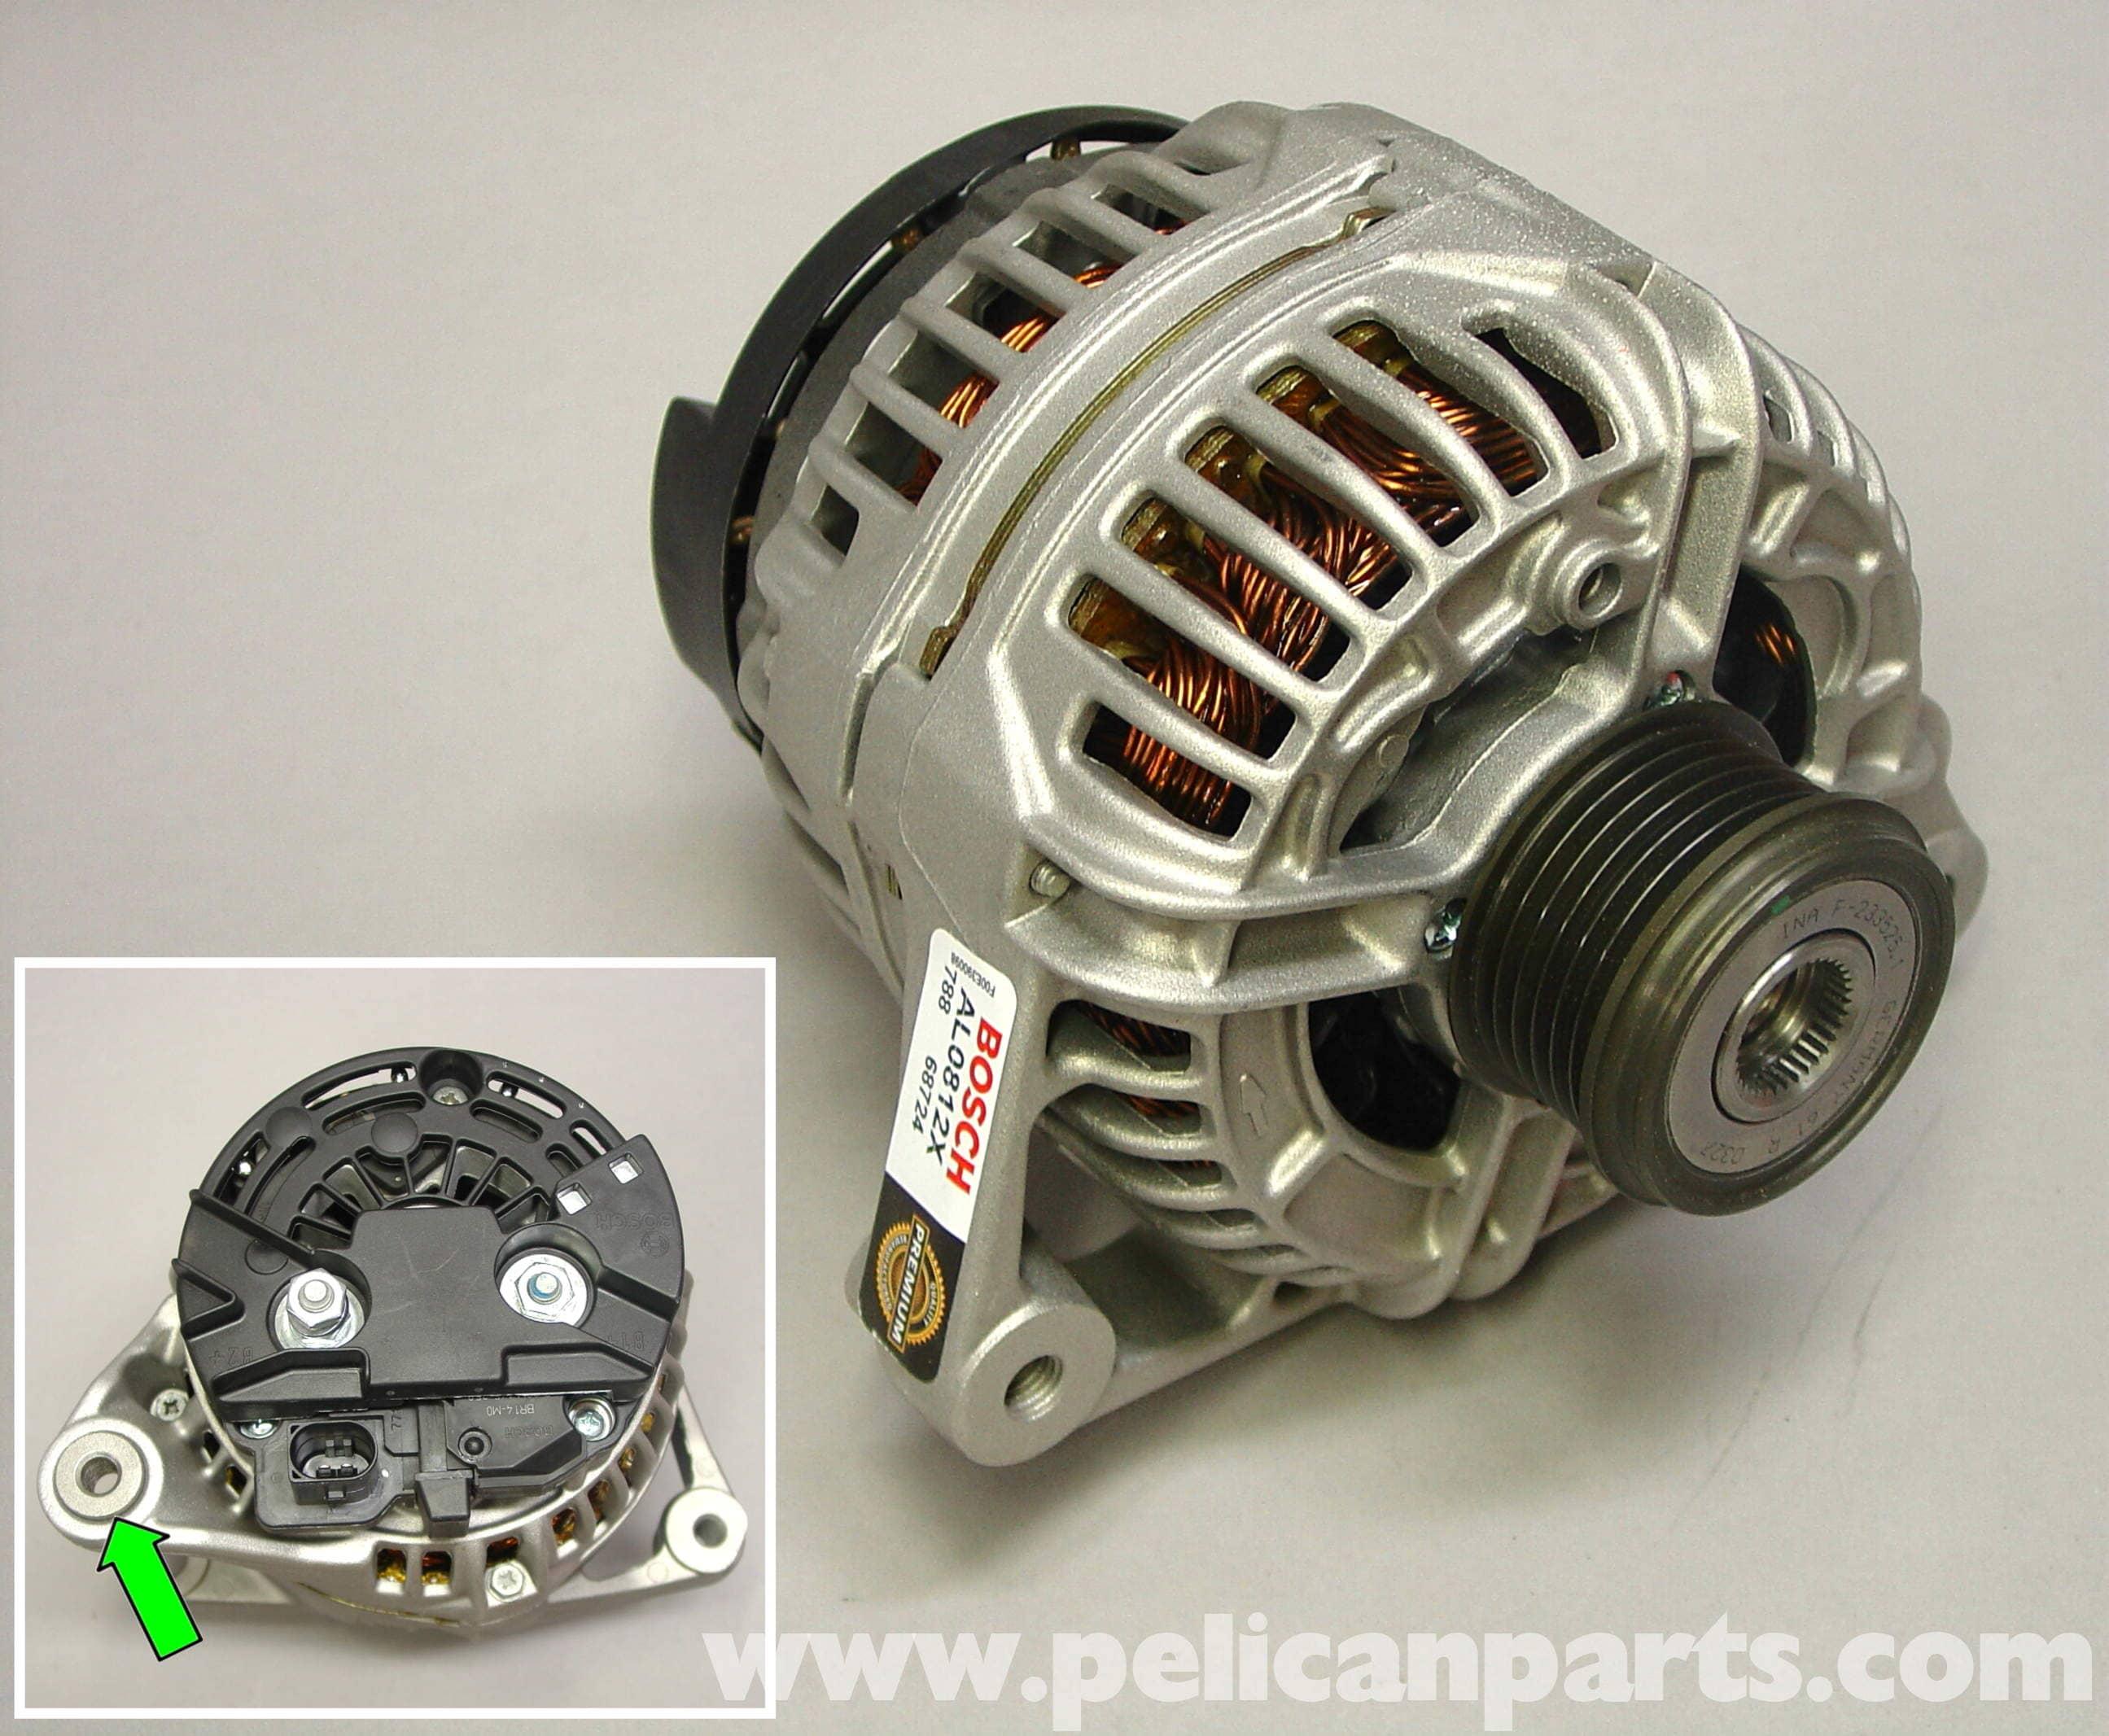 pic01 porsche 911 carrera alternator replacement 996 (1998 2005) 997  at gsmx.co